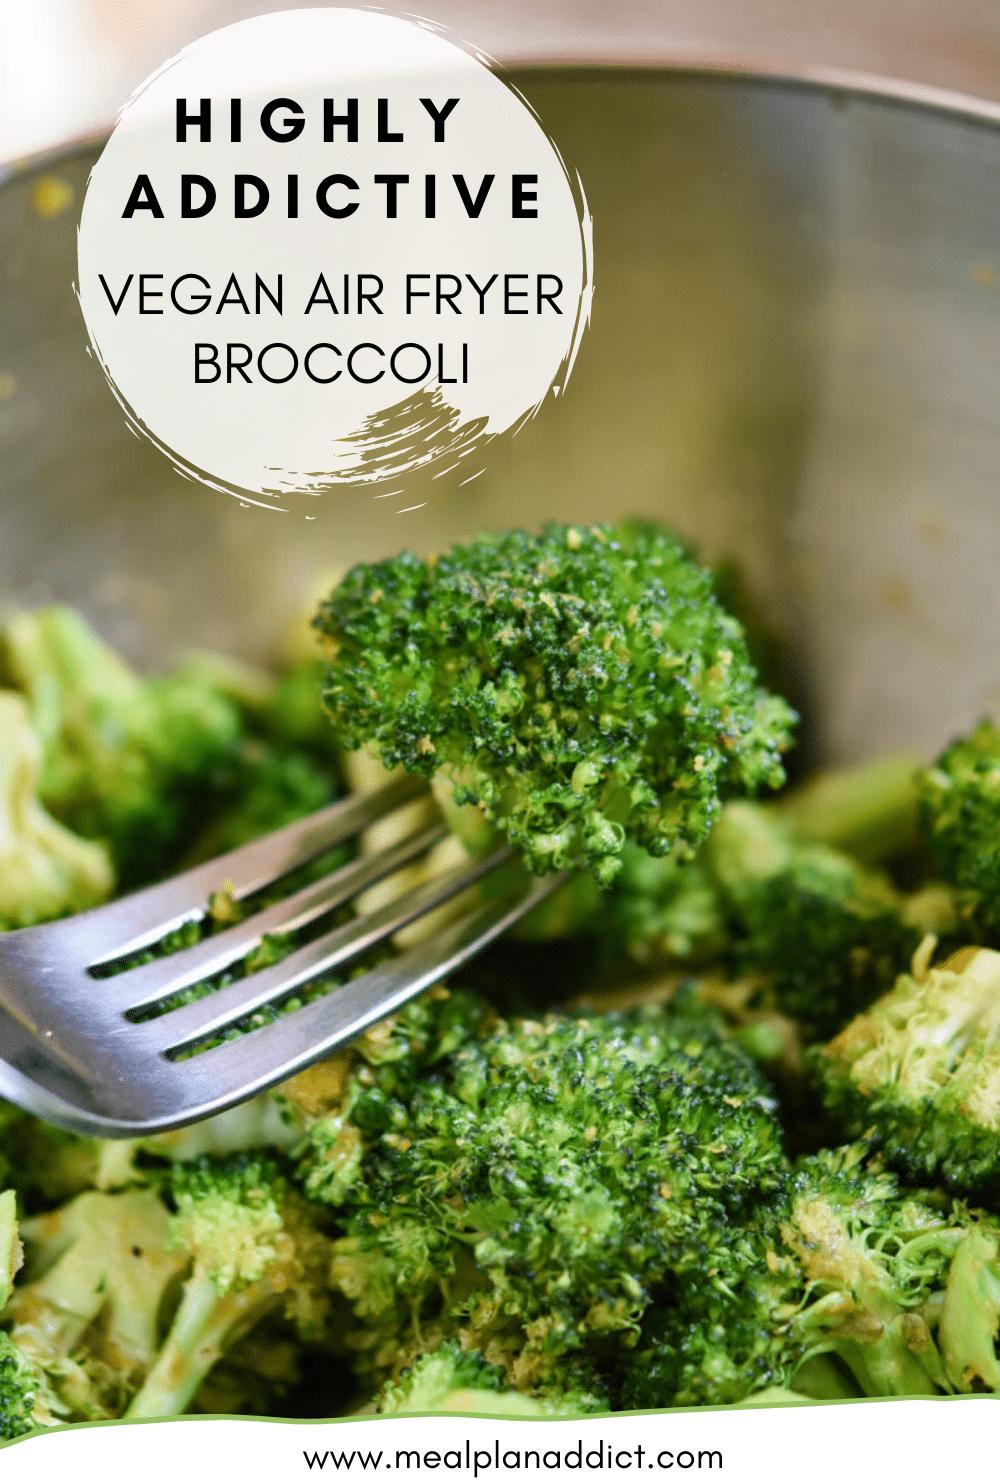 Highly Addictive Vegan Air Fryer Broccoli